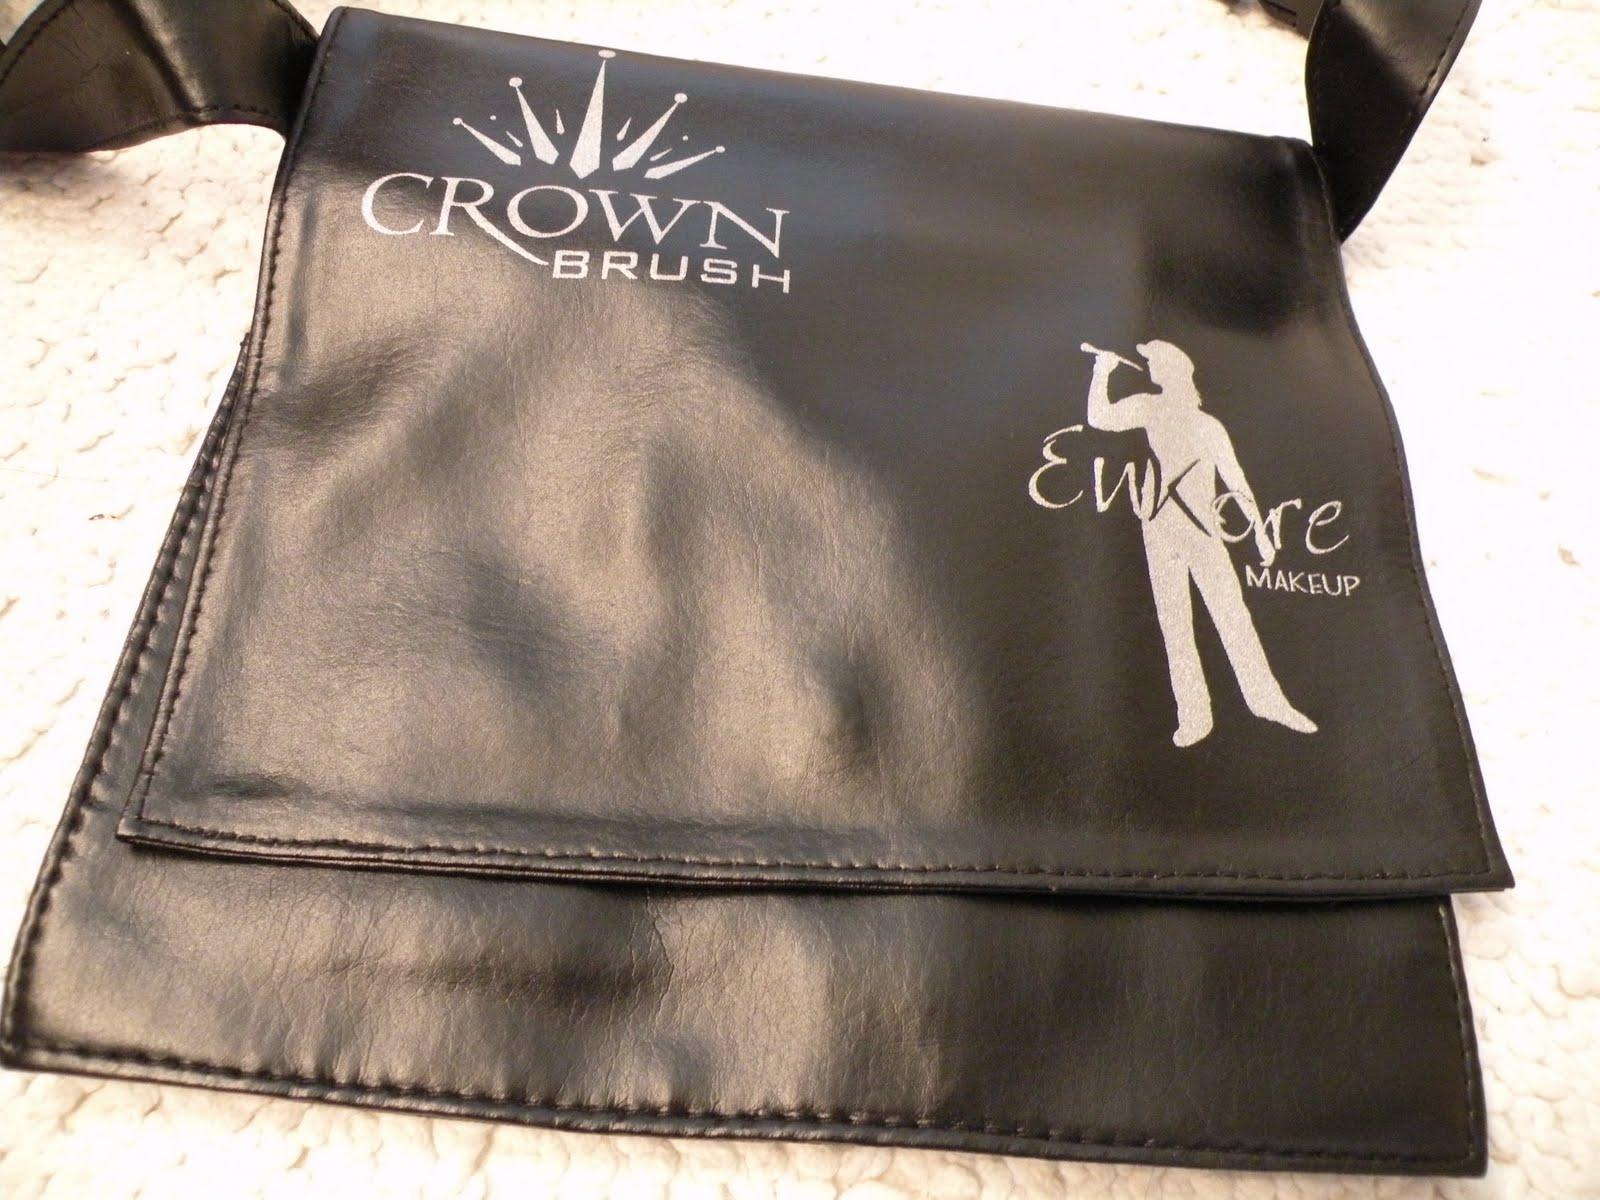 A must have brush set: Enkore & Crown Brush